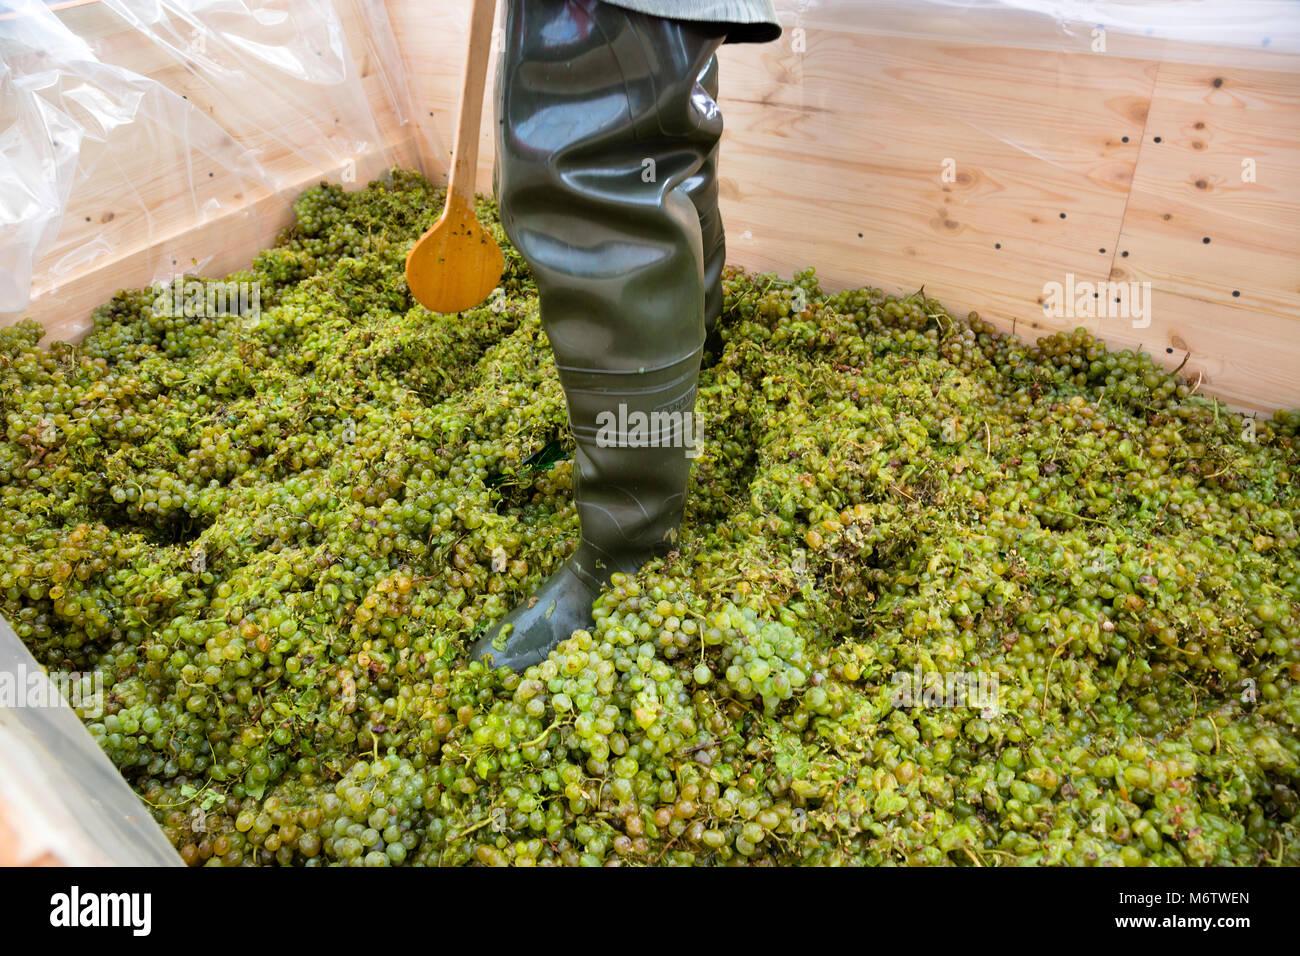 a man pounding grapes in a farm - Stock Image